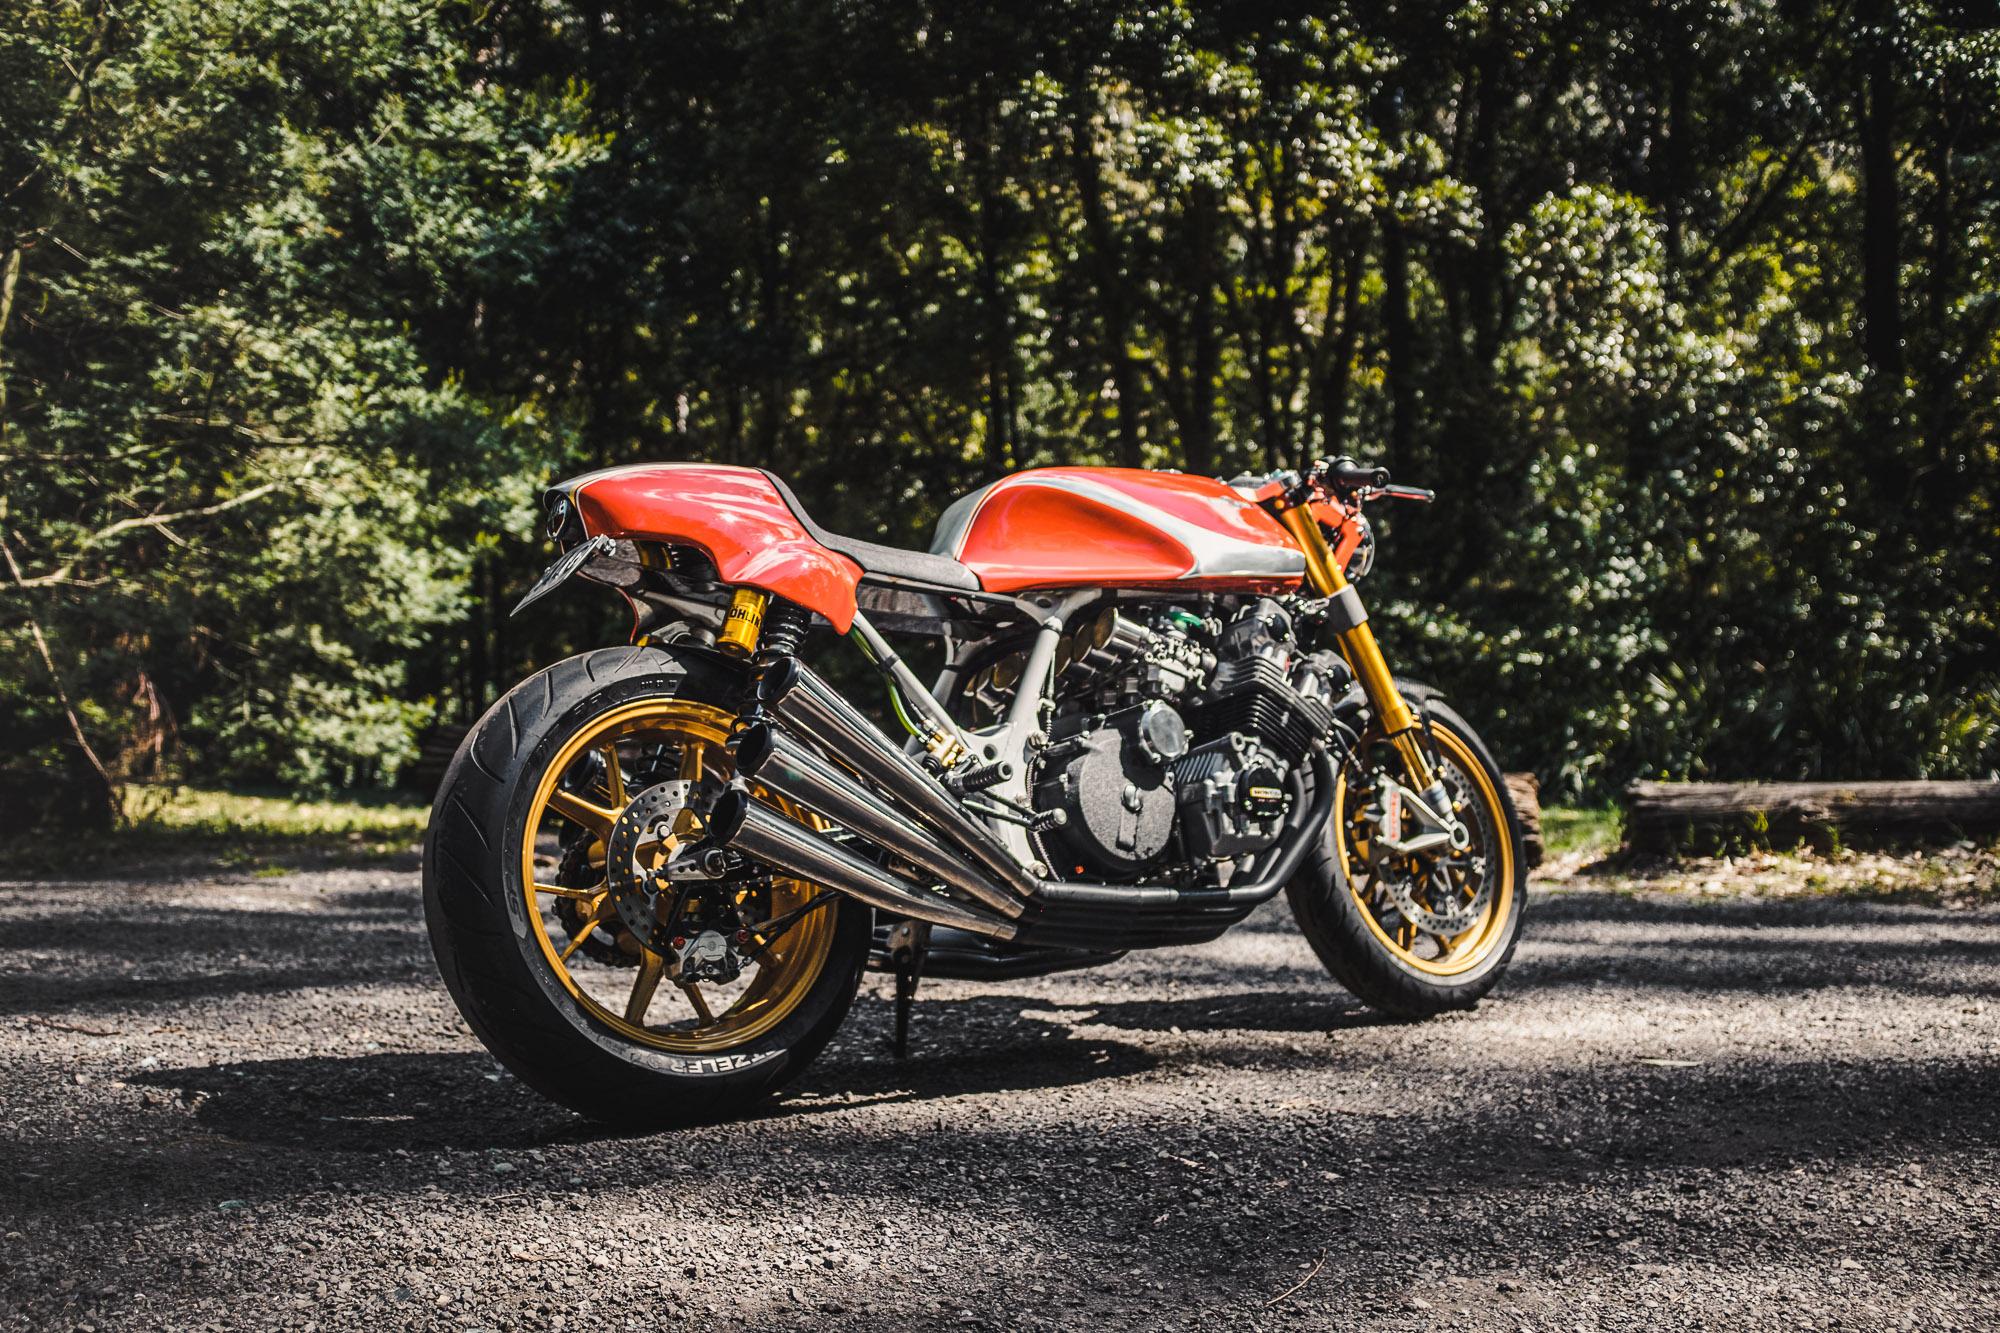 A custom '79 Honda CBX cafe racer motorcycle with custom bodywork by MotorRetro Sydney